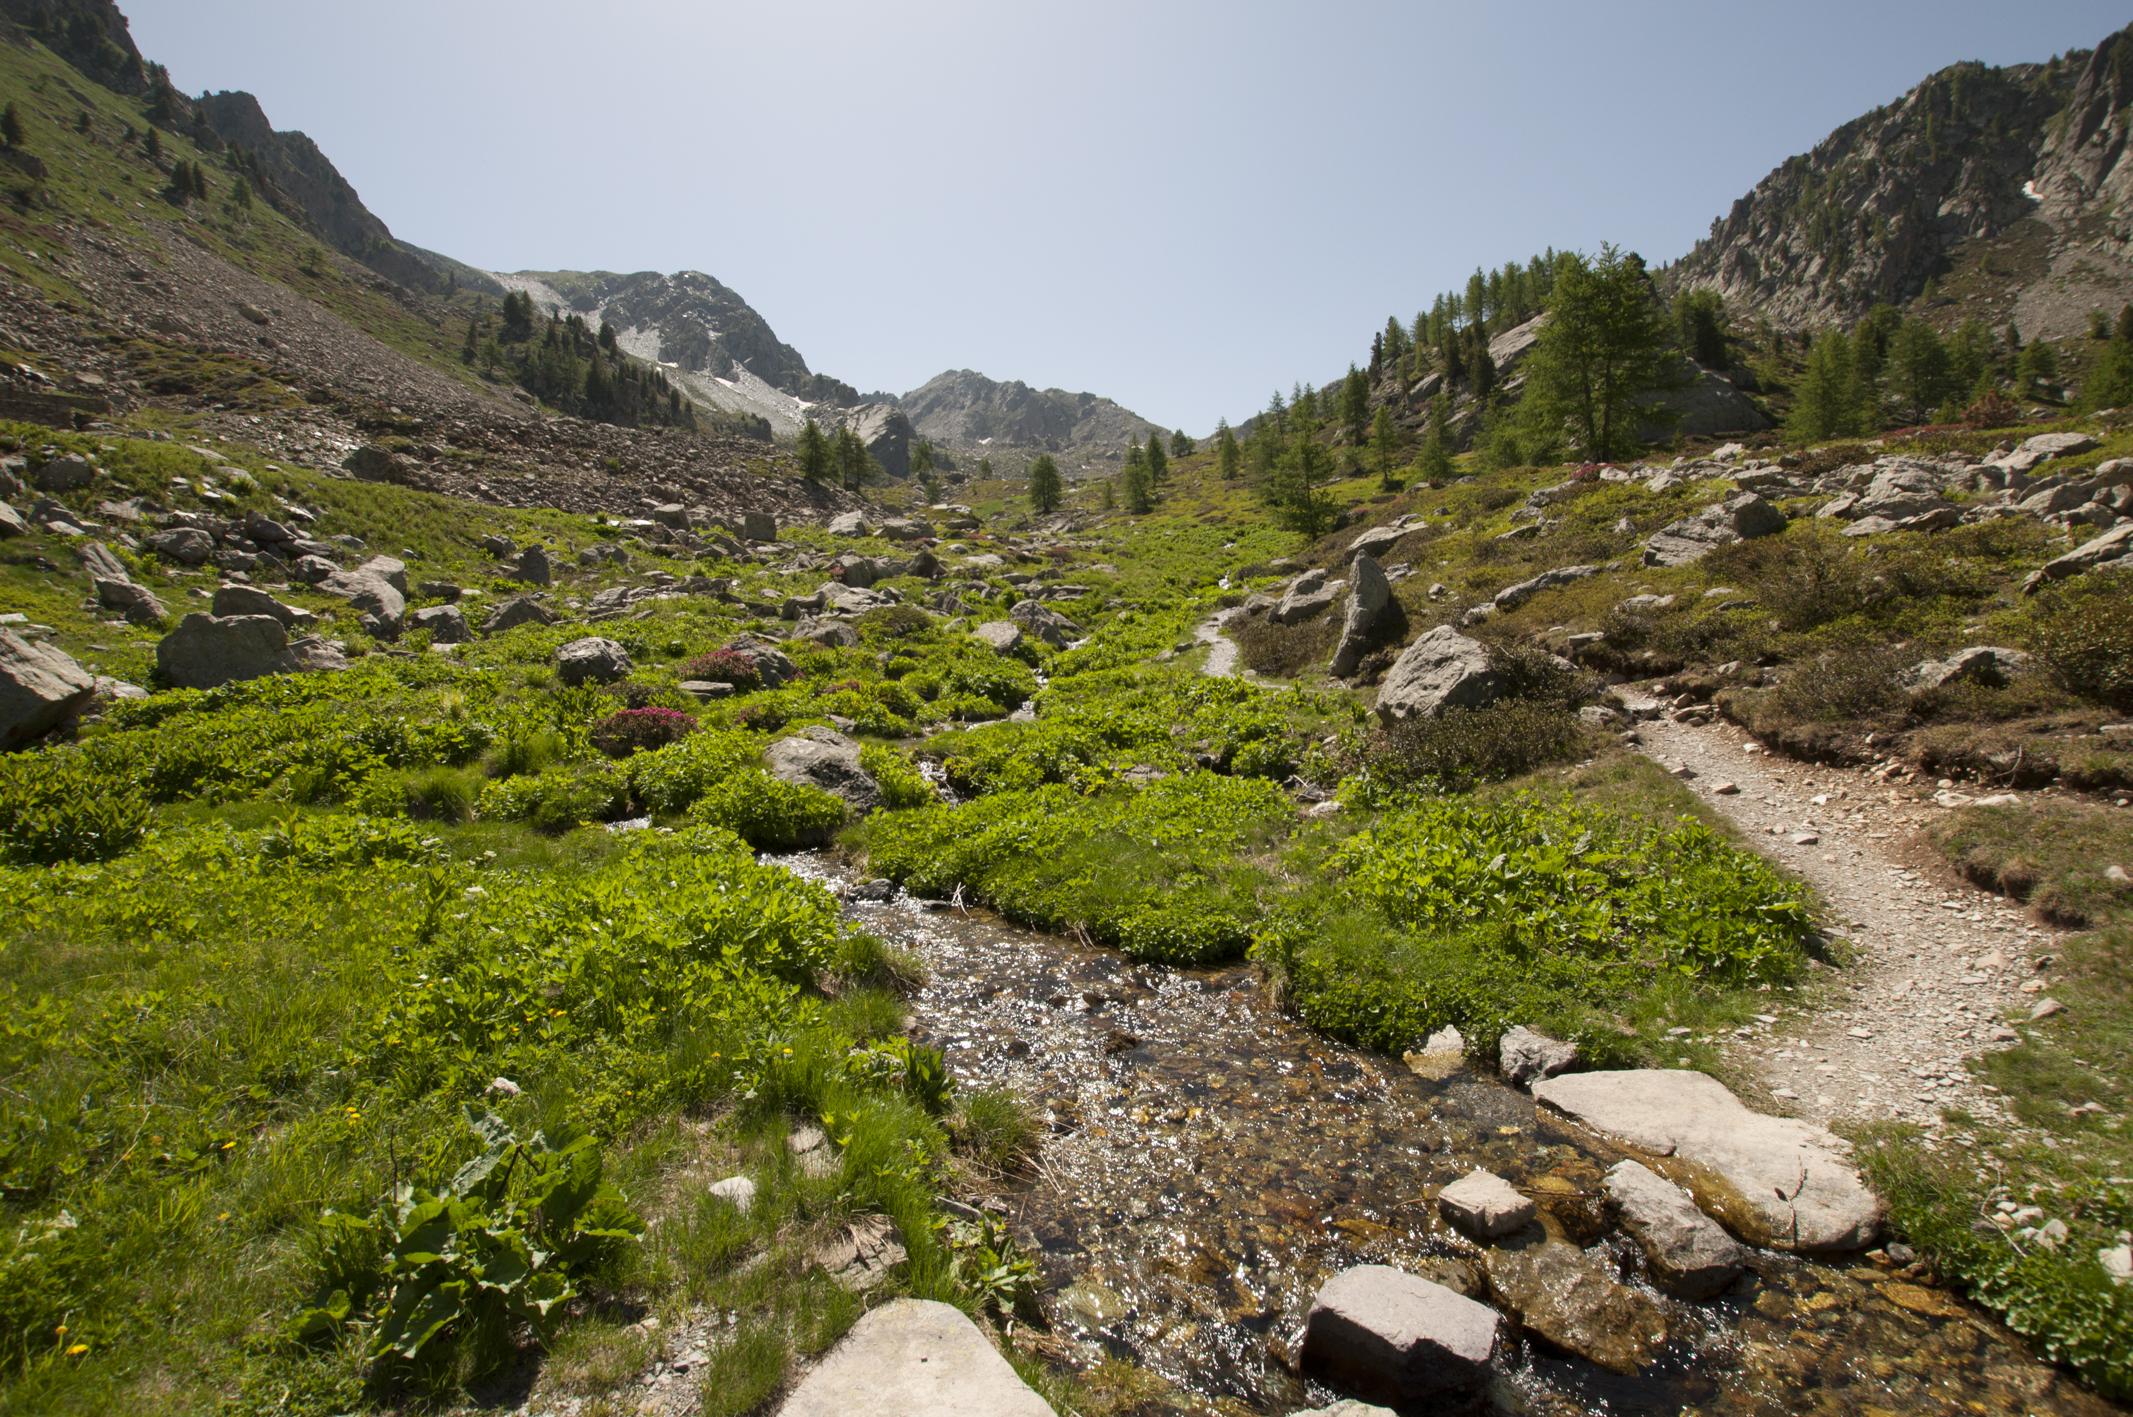 Randonnée - Vallée des Merveilles